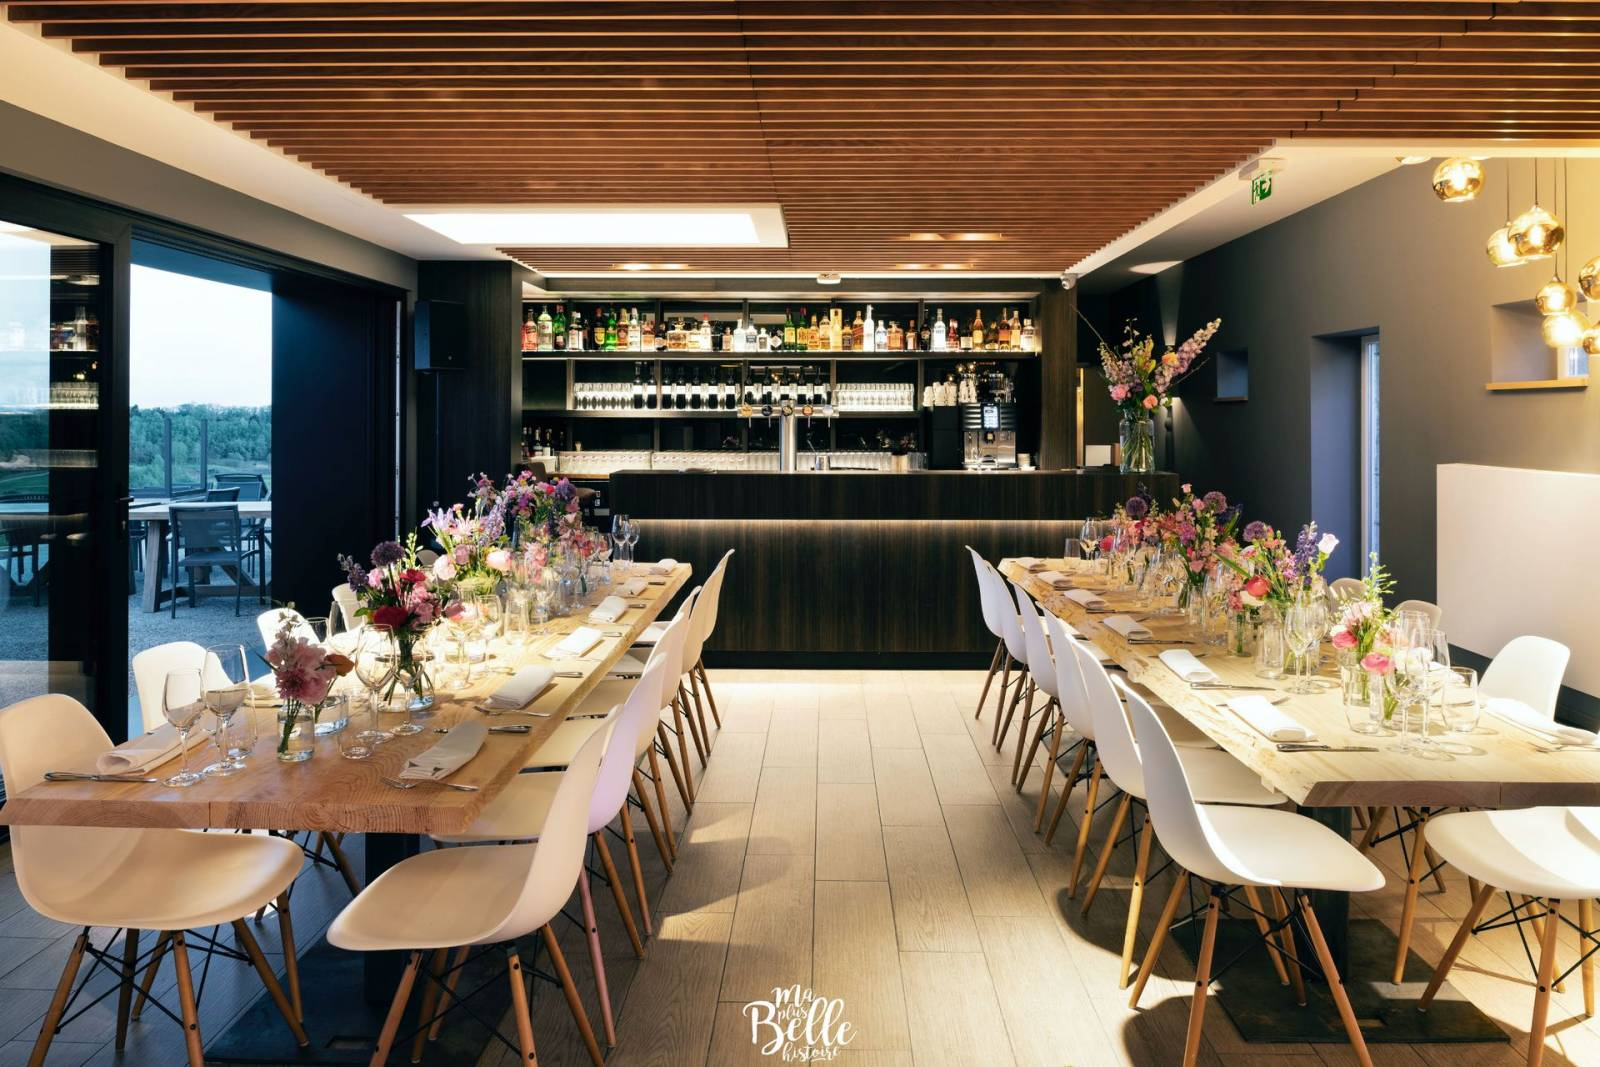 Five Nations Golf Club & Hotel - Feestzaal - Trouwlocatie - Hotel - House of Weddings - 2